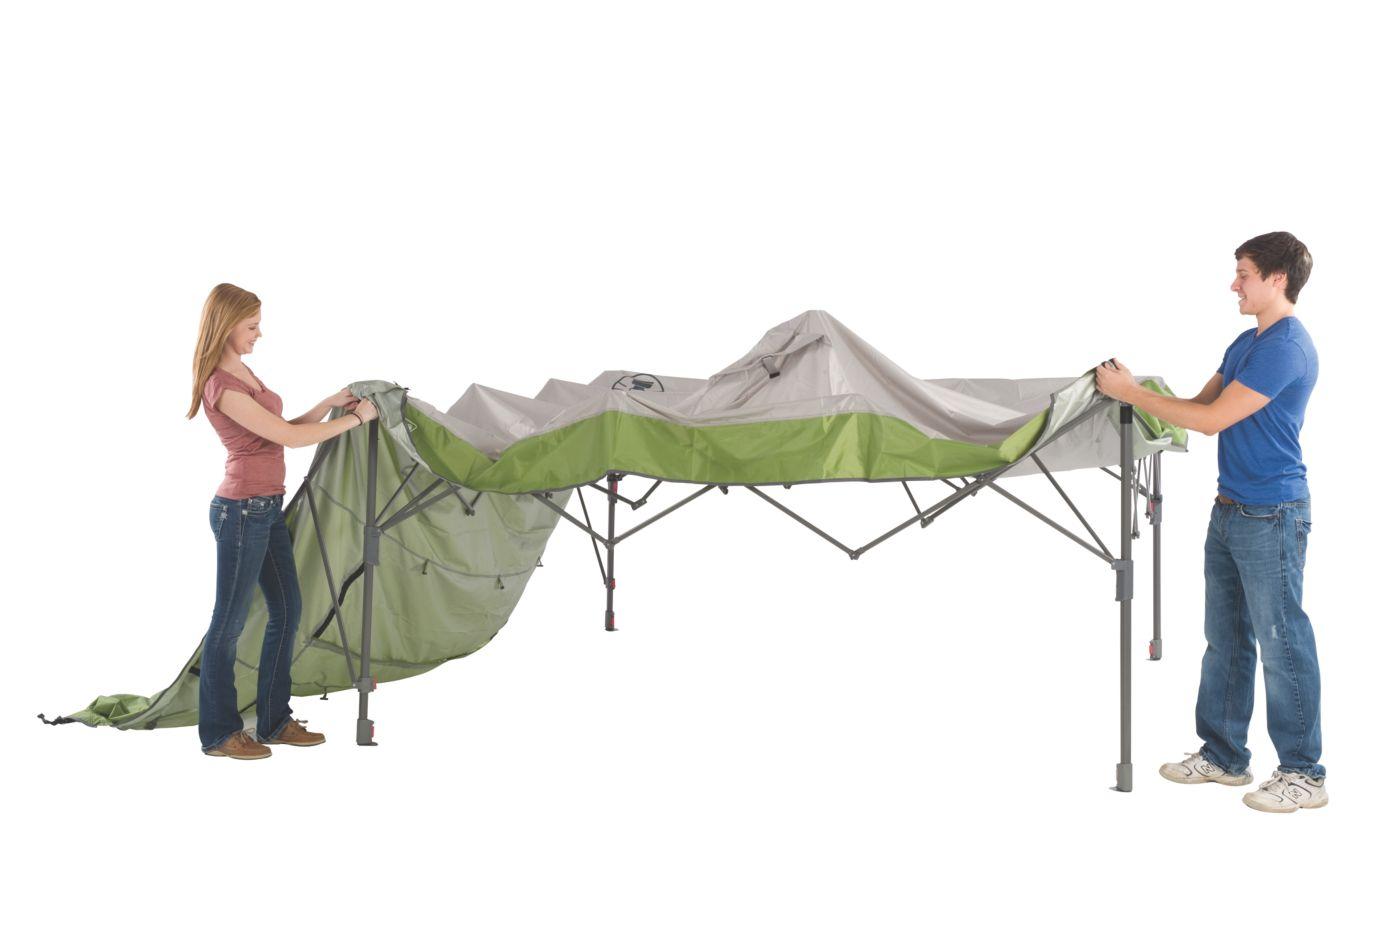 Swingwall Instant Canopy · 10 ft. x 10 ft. Swingwall Instant Canopy  sc 1 st  Coleman & Coleman® Swingwall Instant Canopy 10 ft X 10 ft